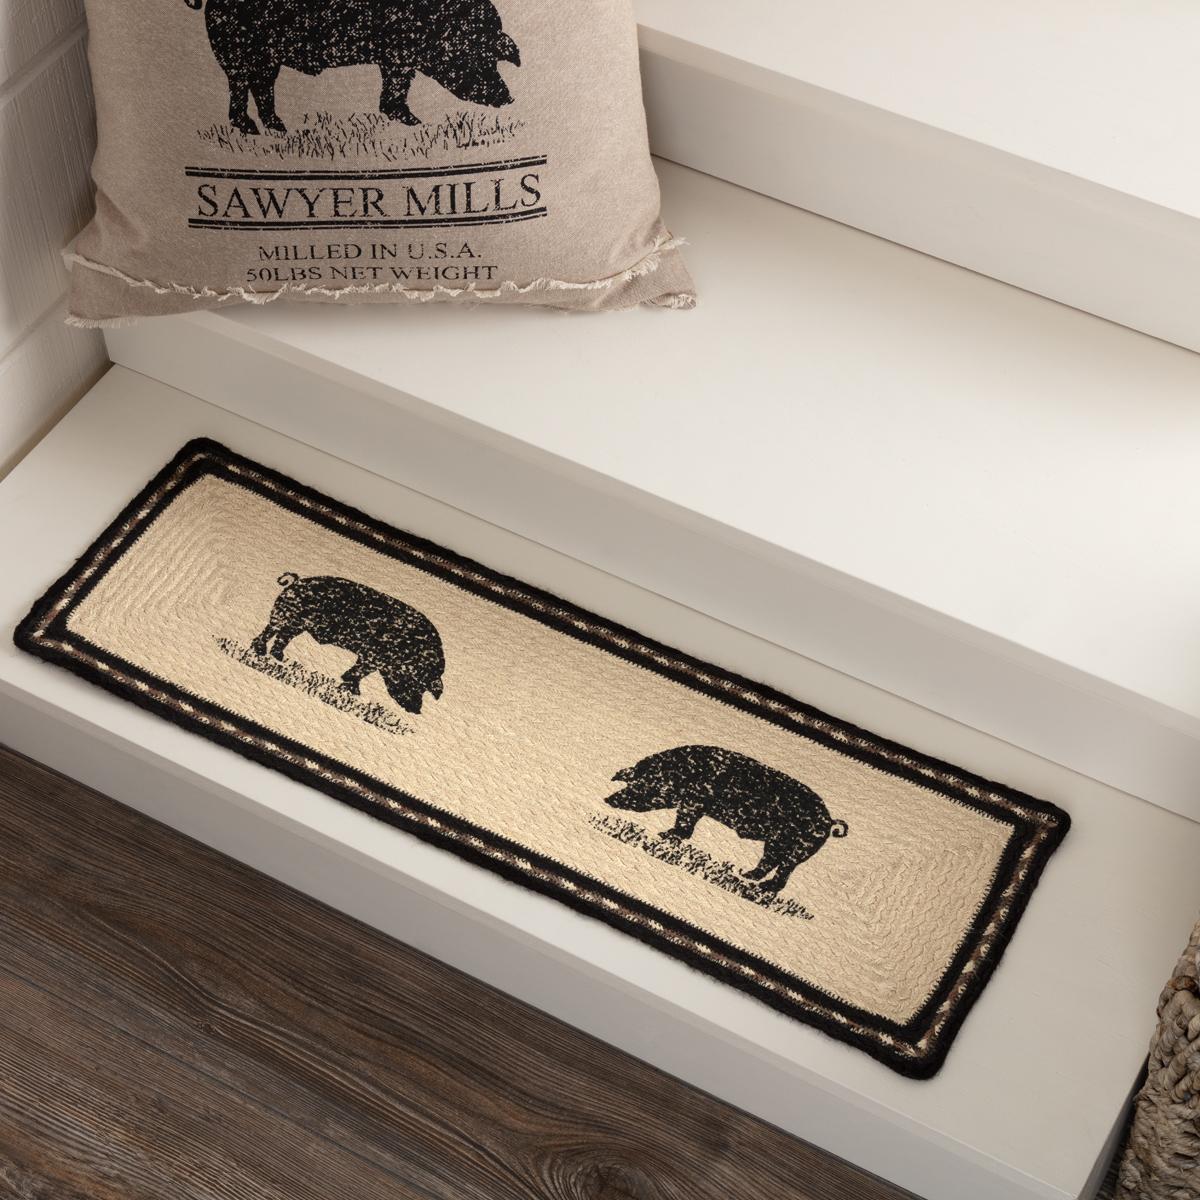 Sawyer Mill Charcoal Pig Jute Stair Tread Rect Latex 8.5x27